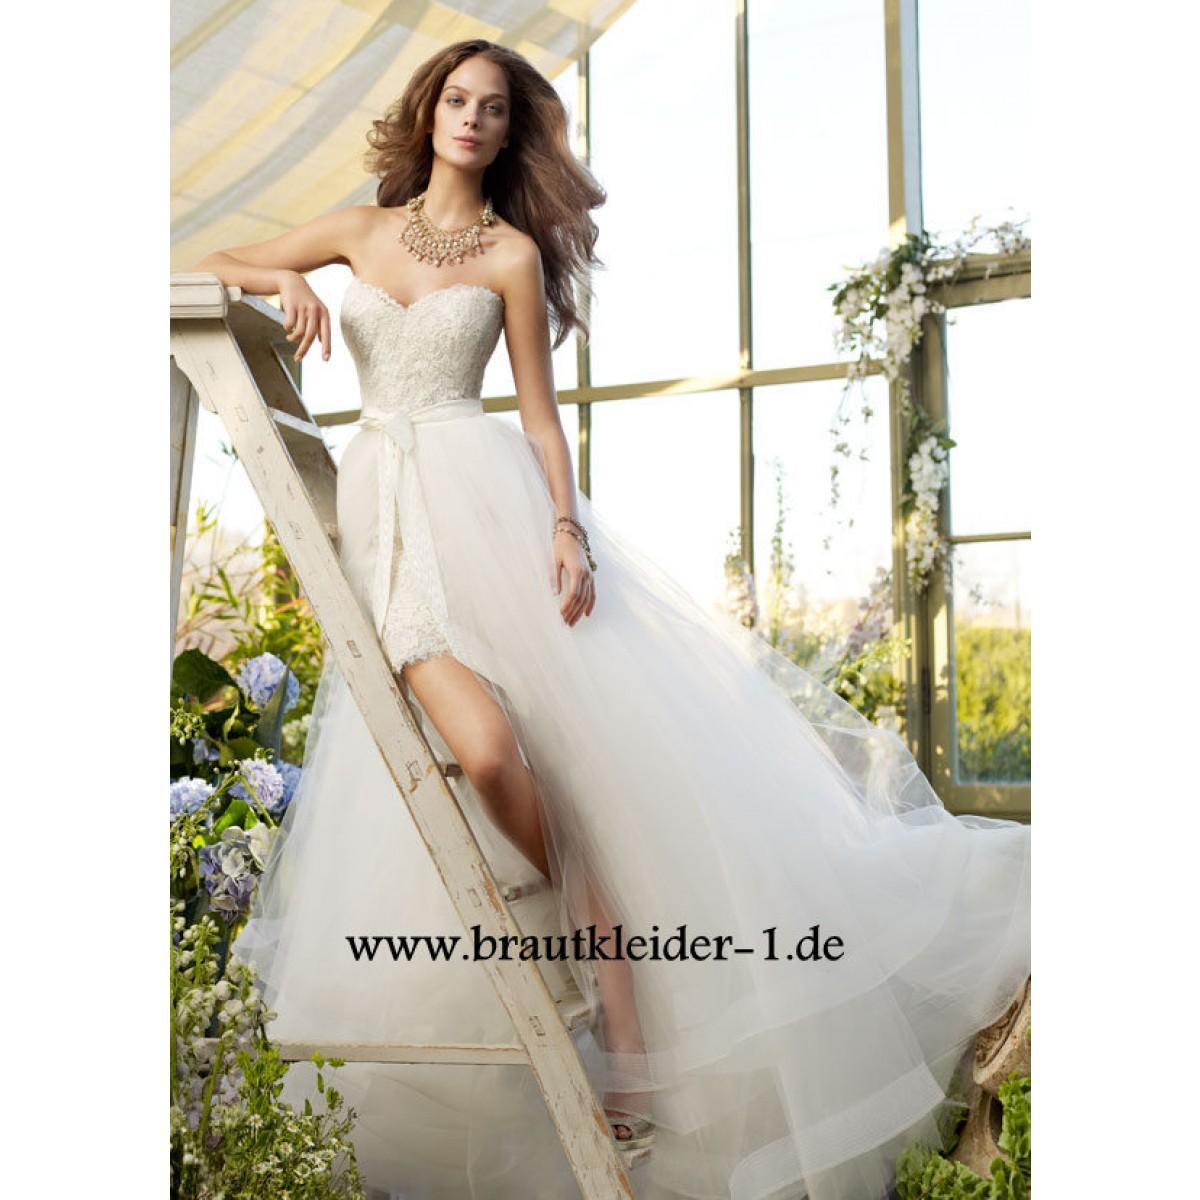 Brautkleider auf Rechnung: Vokuhila Brautkleider - Vokuhila Brautkleid ...